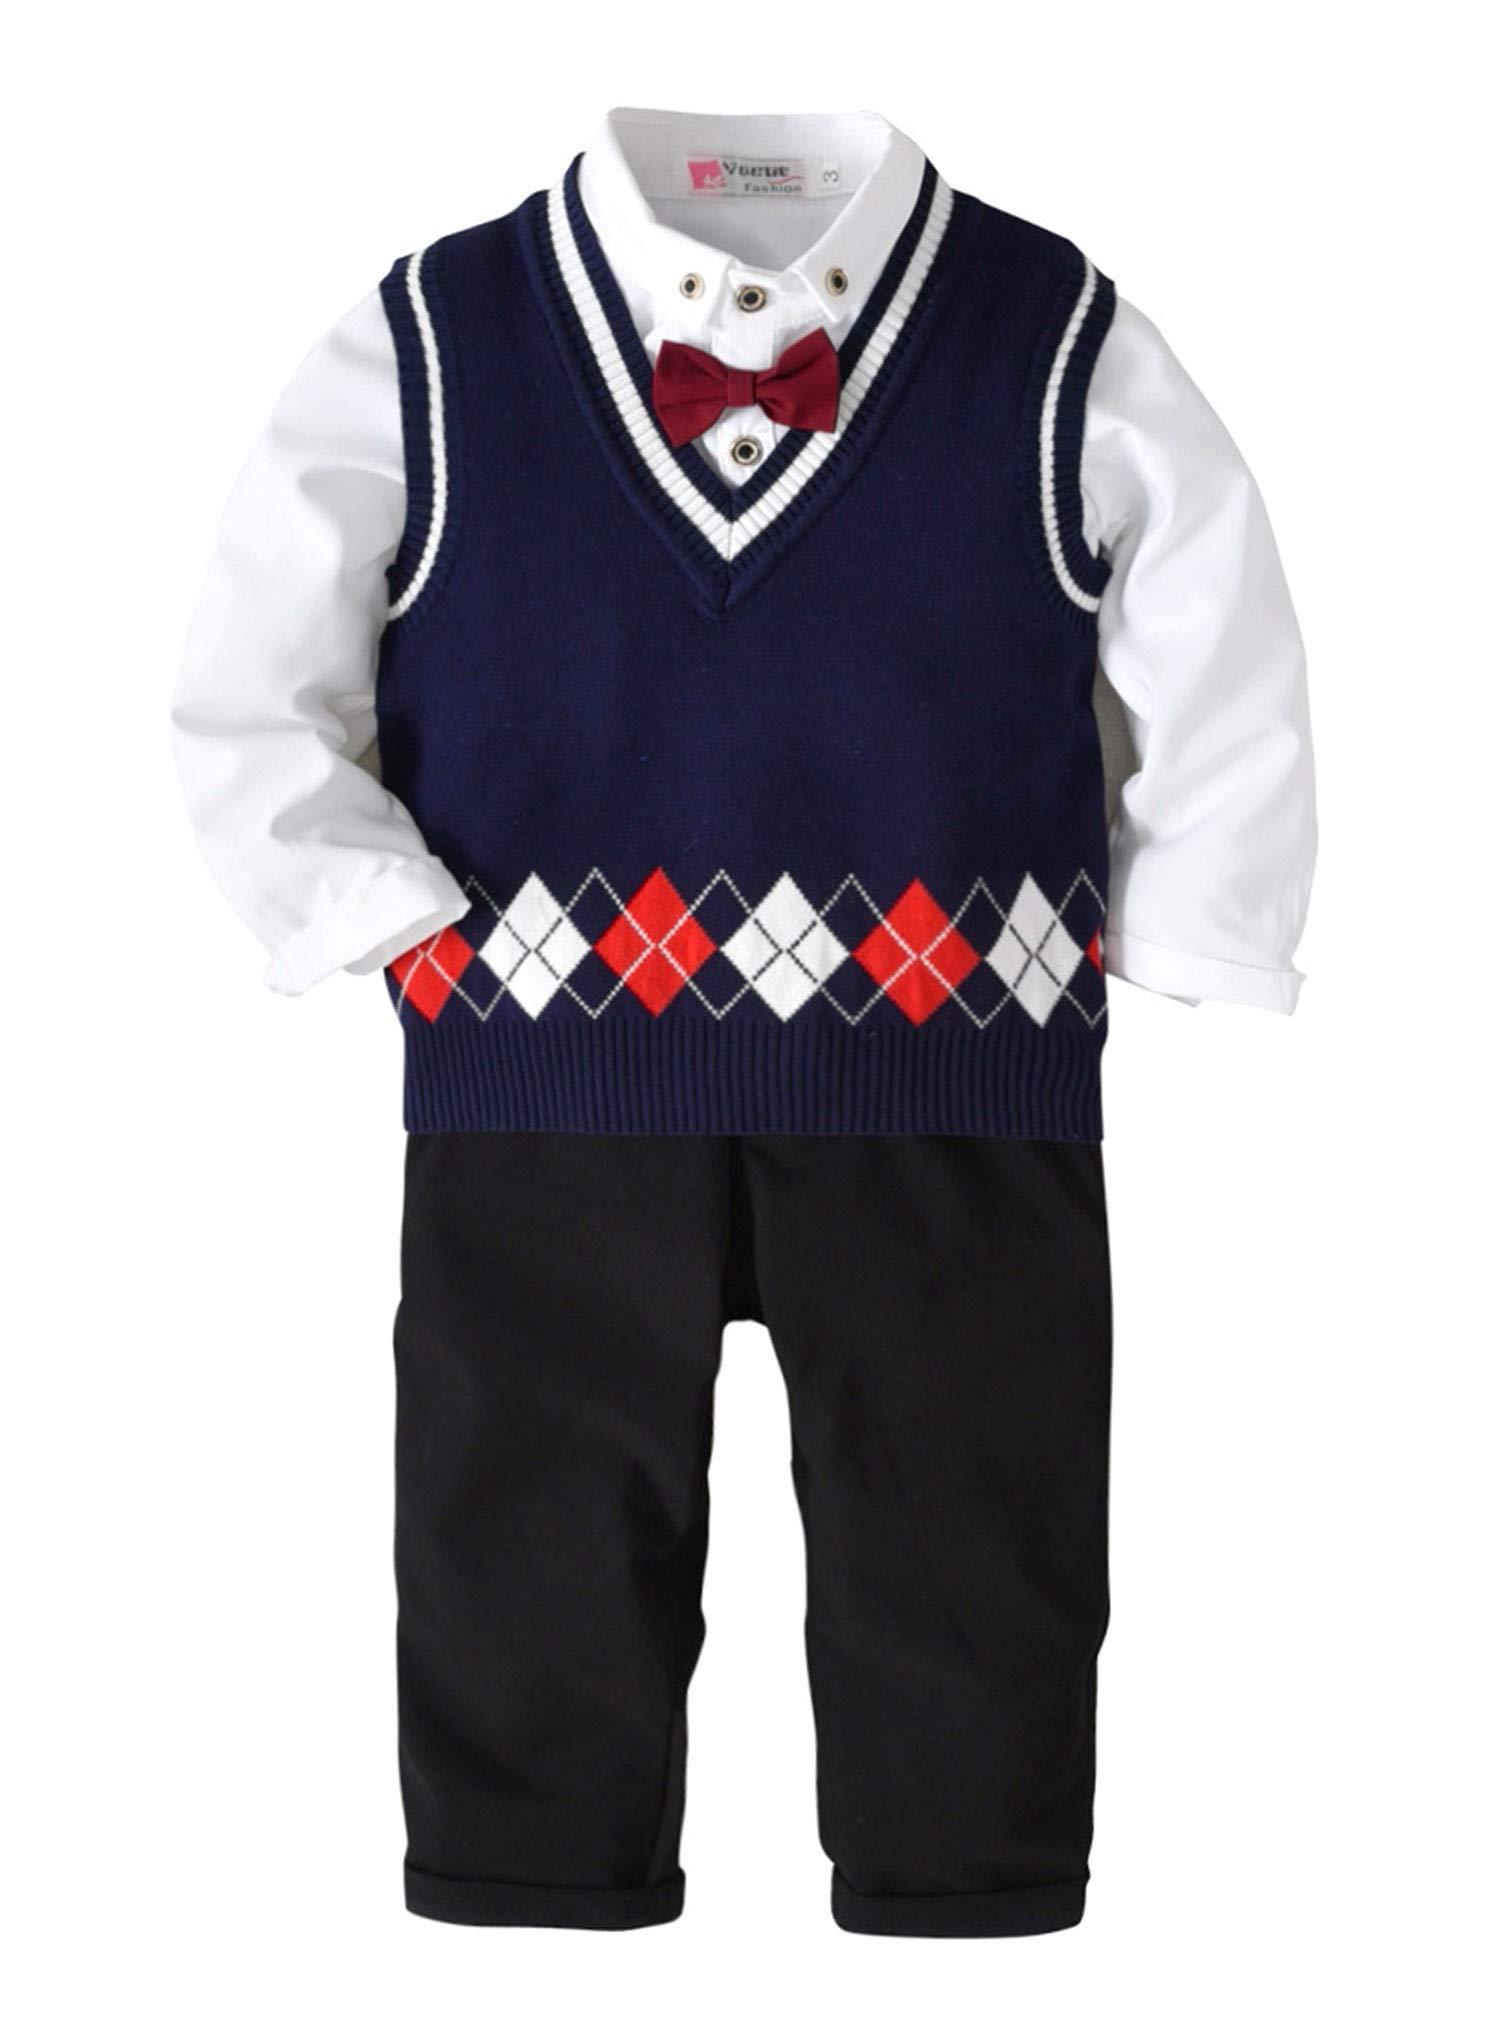 Pinleck Tollder Baby Boy Clothes Bowtie Gentleman Shirt Kint Sweater Vest Pants Outfits (Navy Blue, 140/Fit 6-7 T)